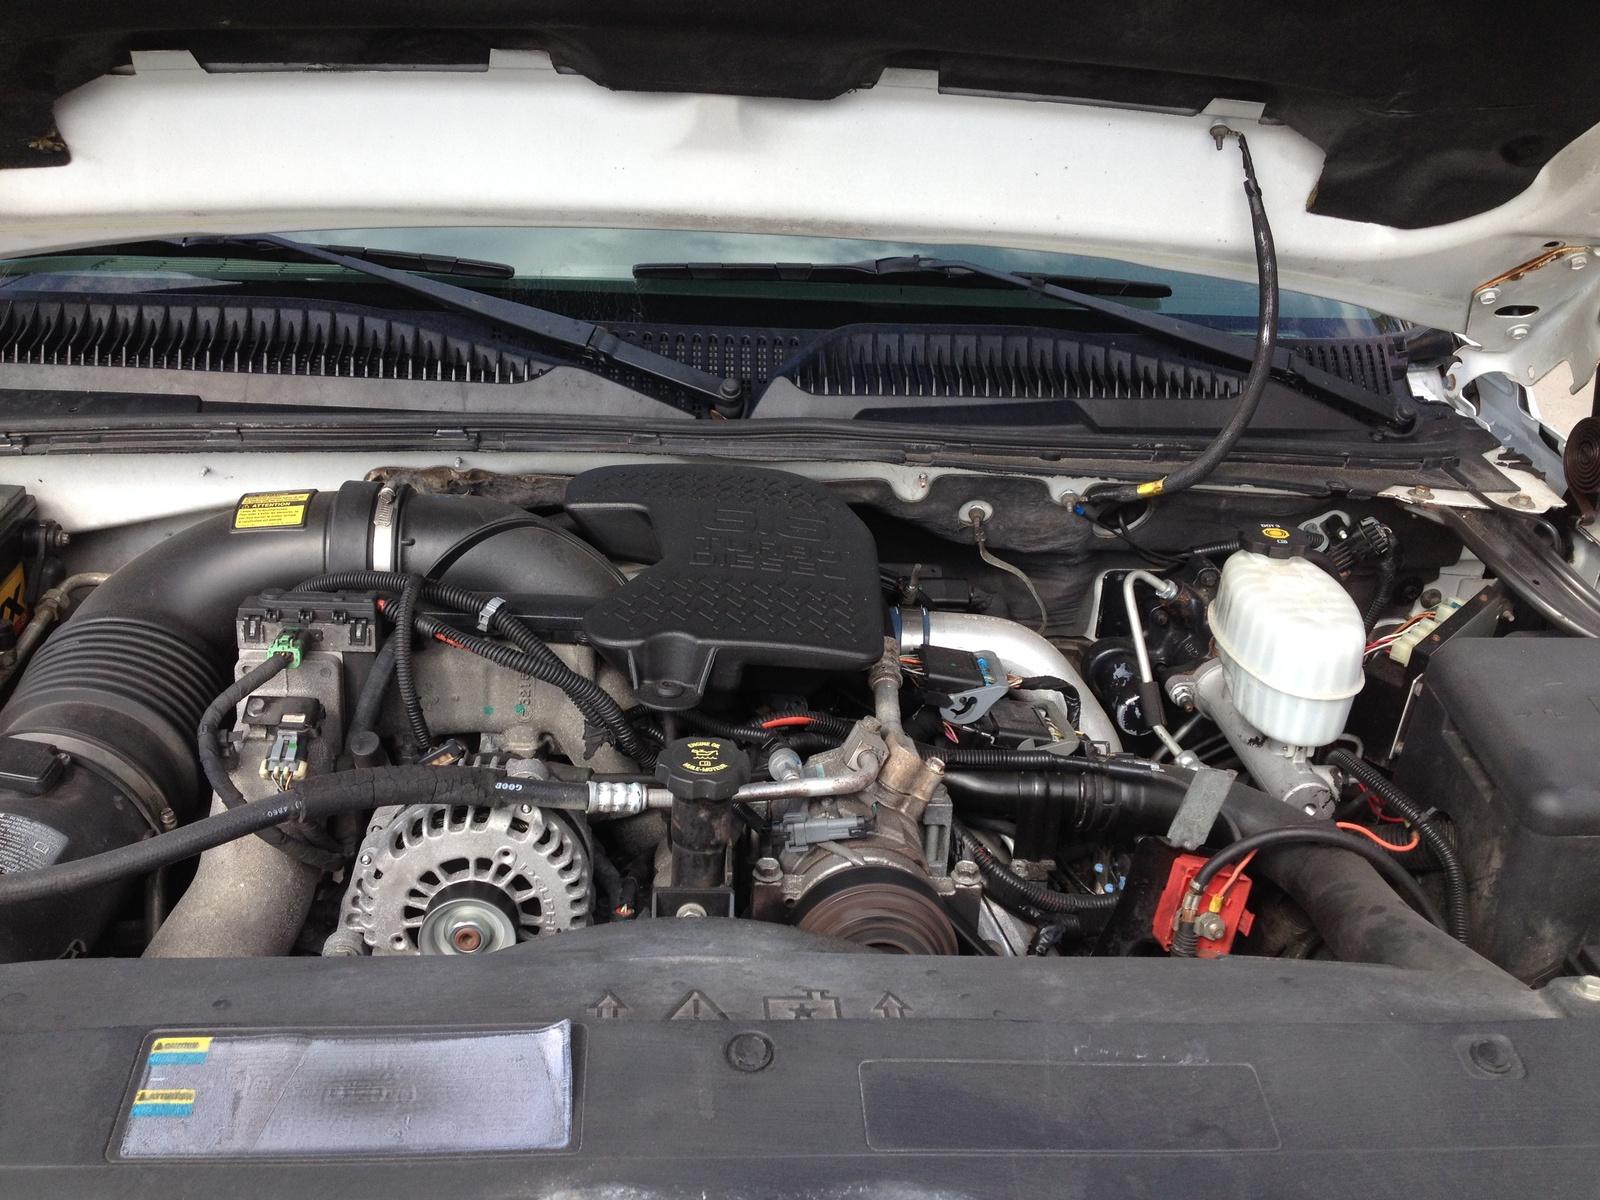 Picture of 2006 Chevrolet Silverado 3500 LS 4dr Crew Cab 4WD LB DRW, engine